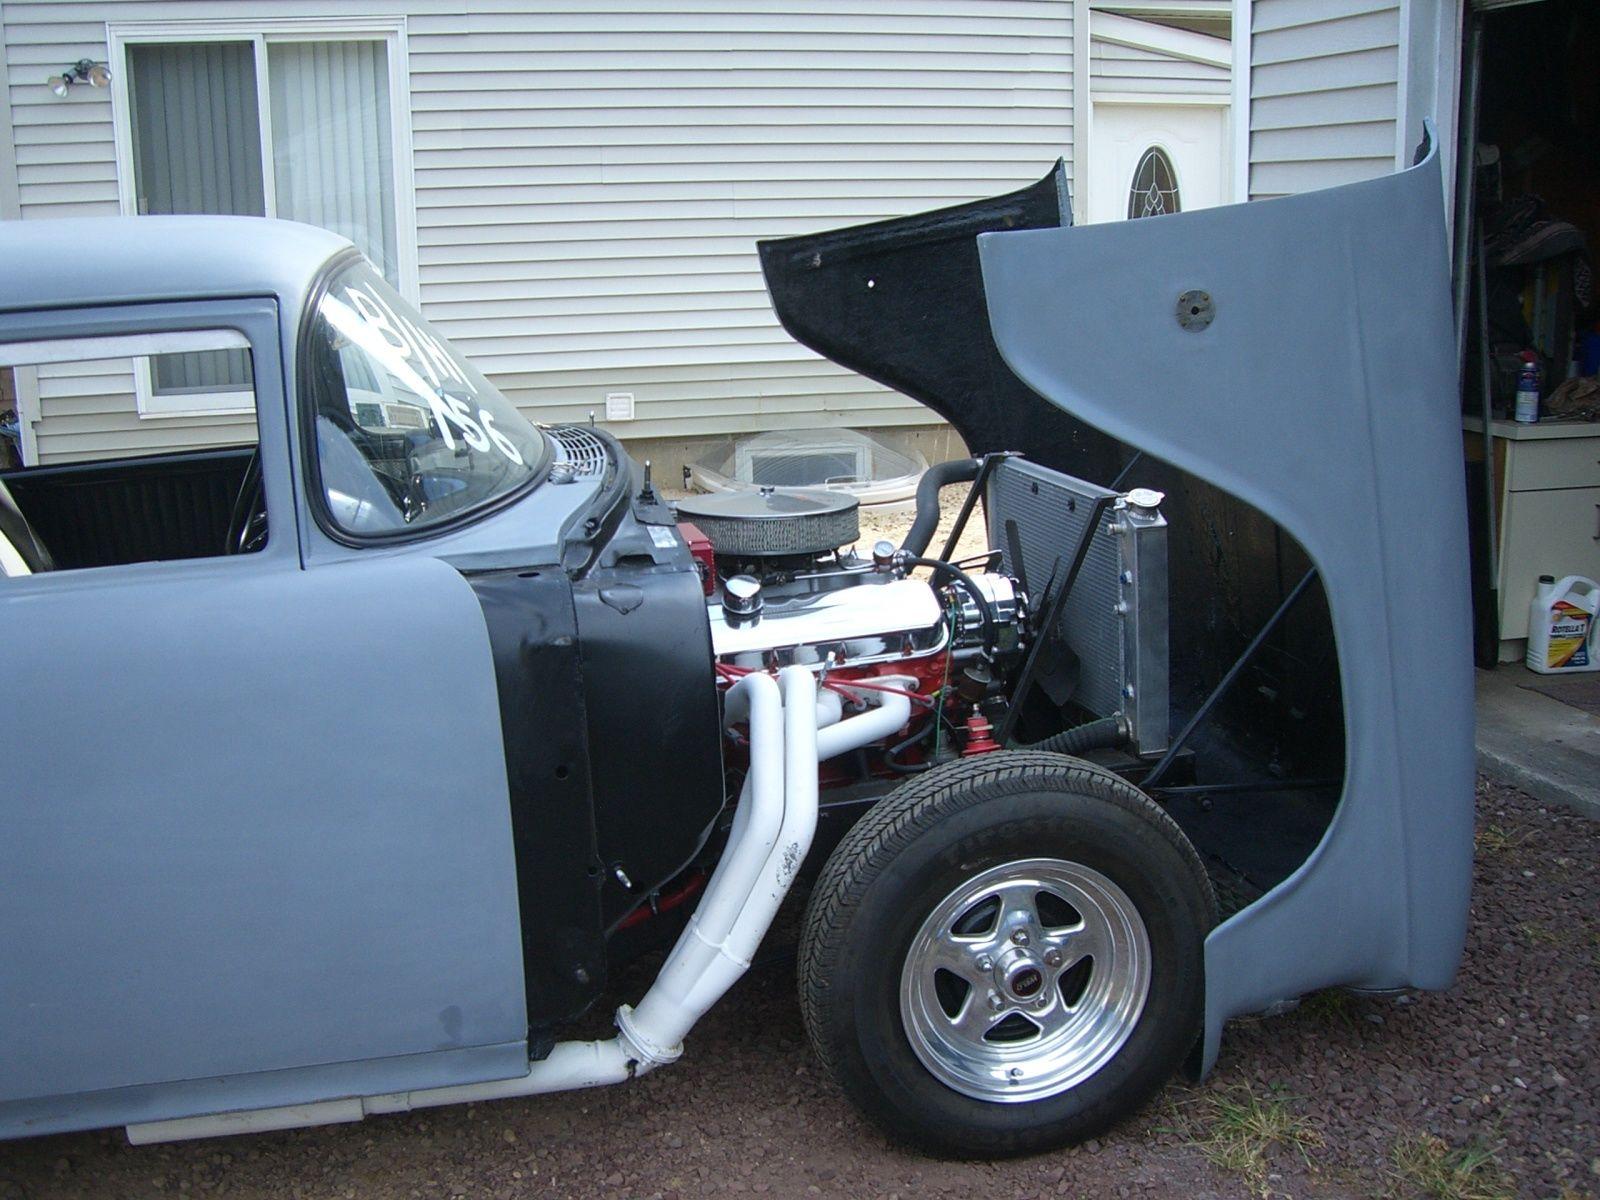 1955 Chevy Two Lane Blacktop Tribute Clone 4 Speed Big Block 454 2 Door Sedan For Sale Classic Chevrolet Bel Air 150 210